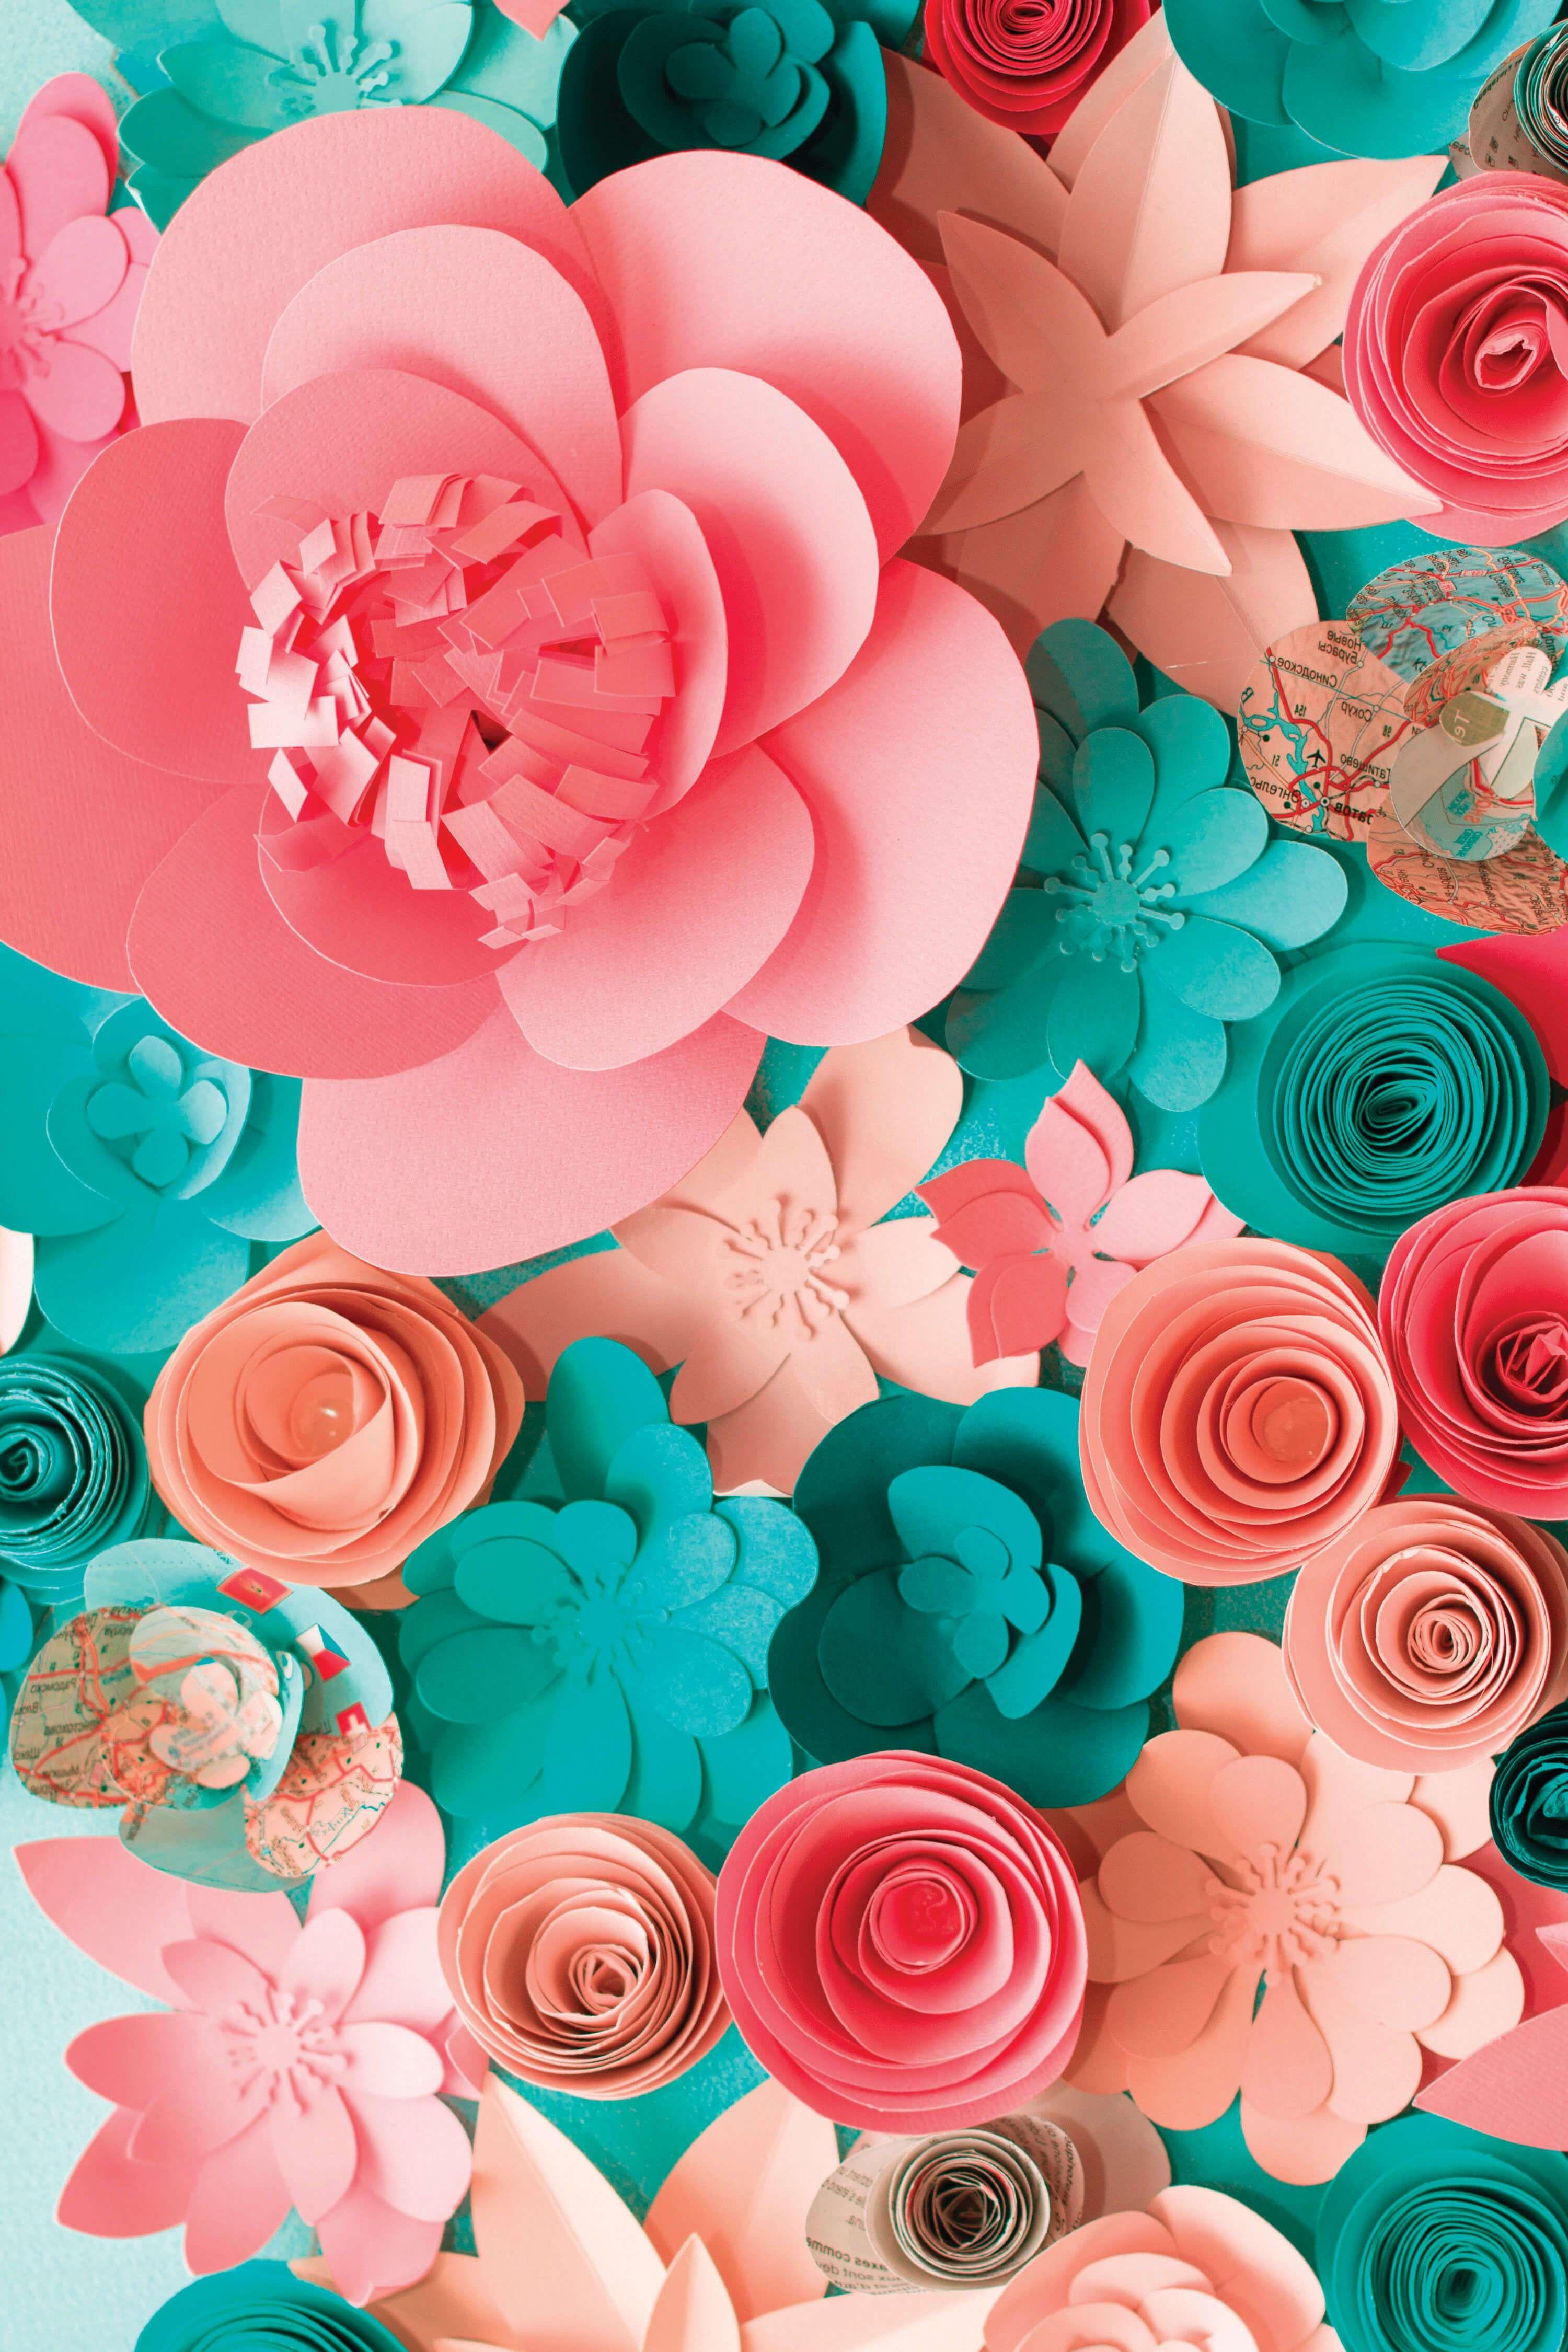 Paper Flower Art By Abbi Kirsten Meet The Creatives Interview By